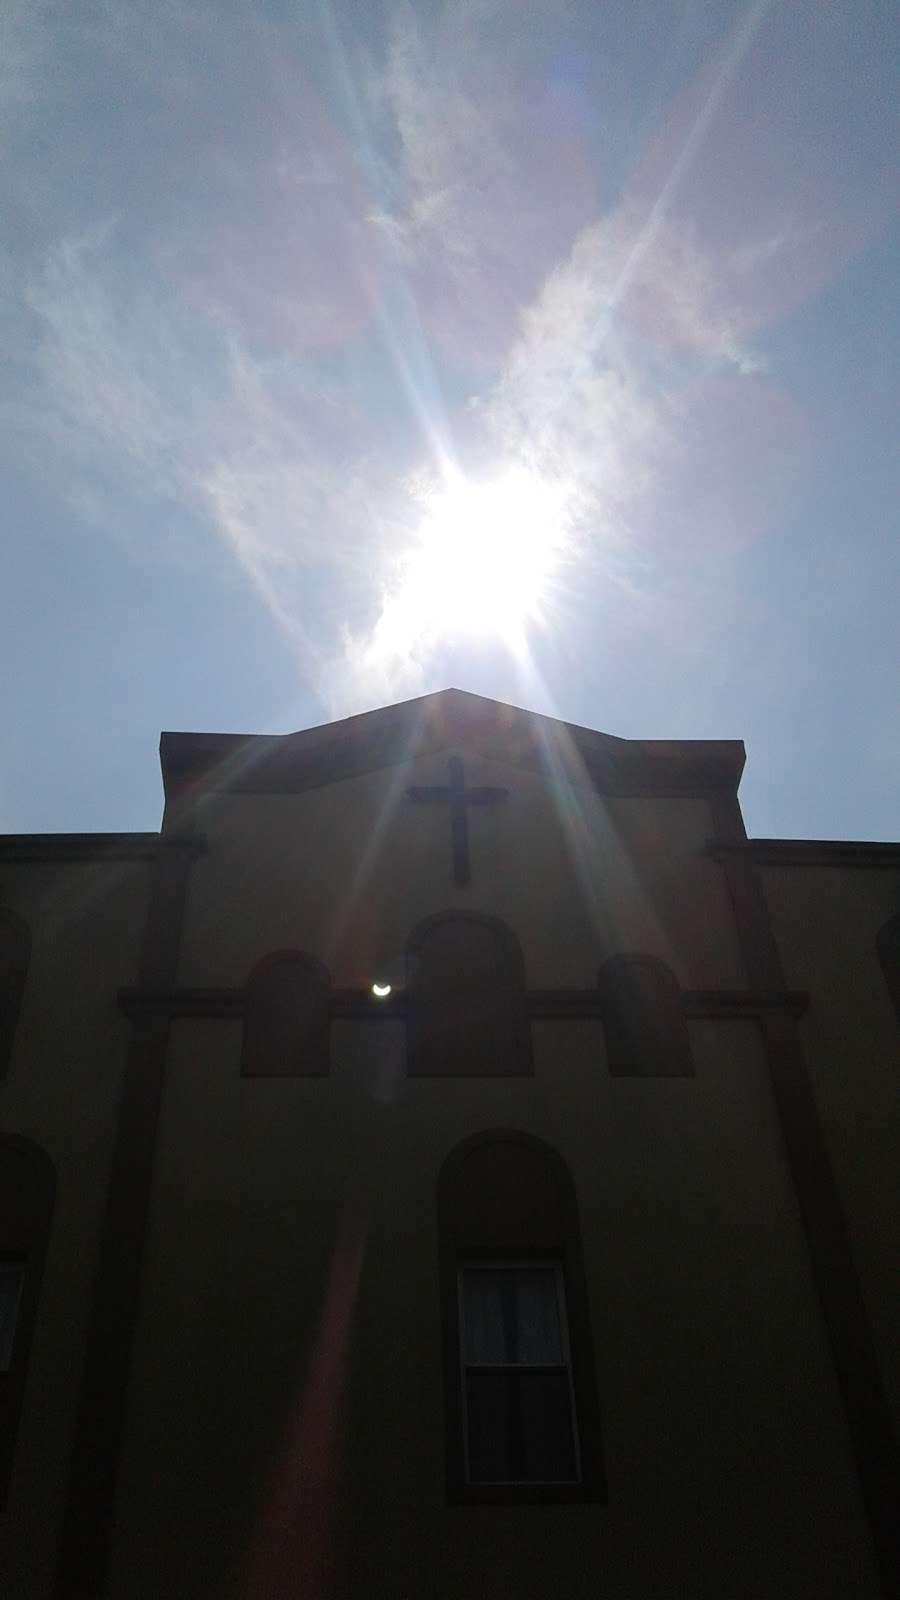 Resurrection Church - church  | Photo 6 of 6 | Address: 740 40th St, Brooklyn, NY 11232, USA | Phone: (718) 436-0242